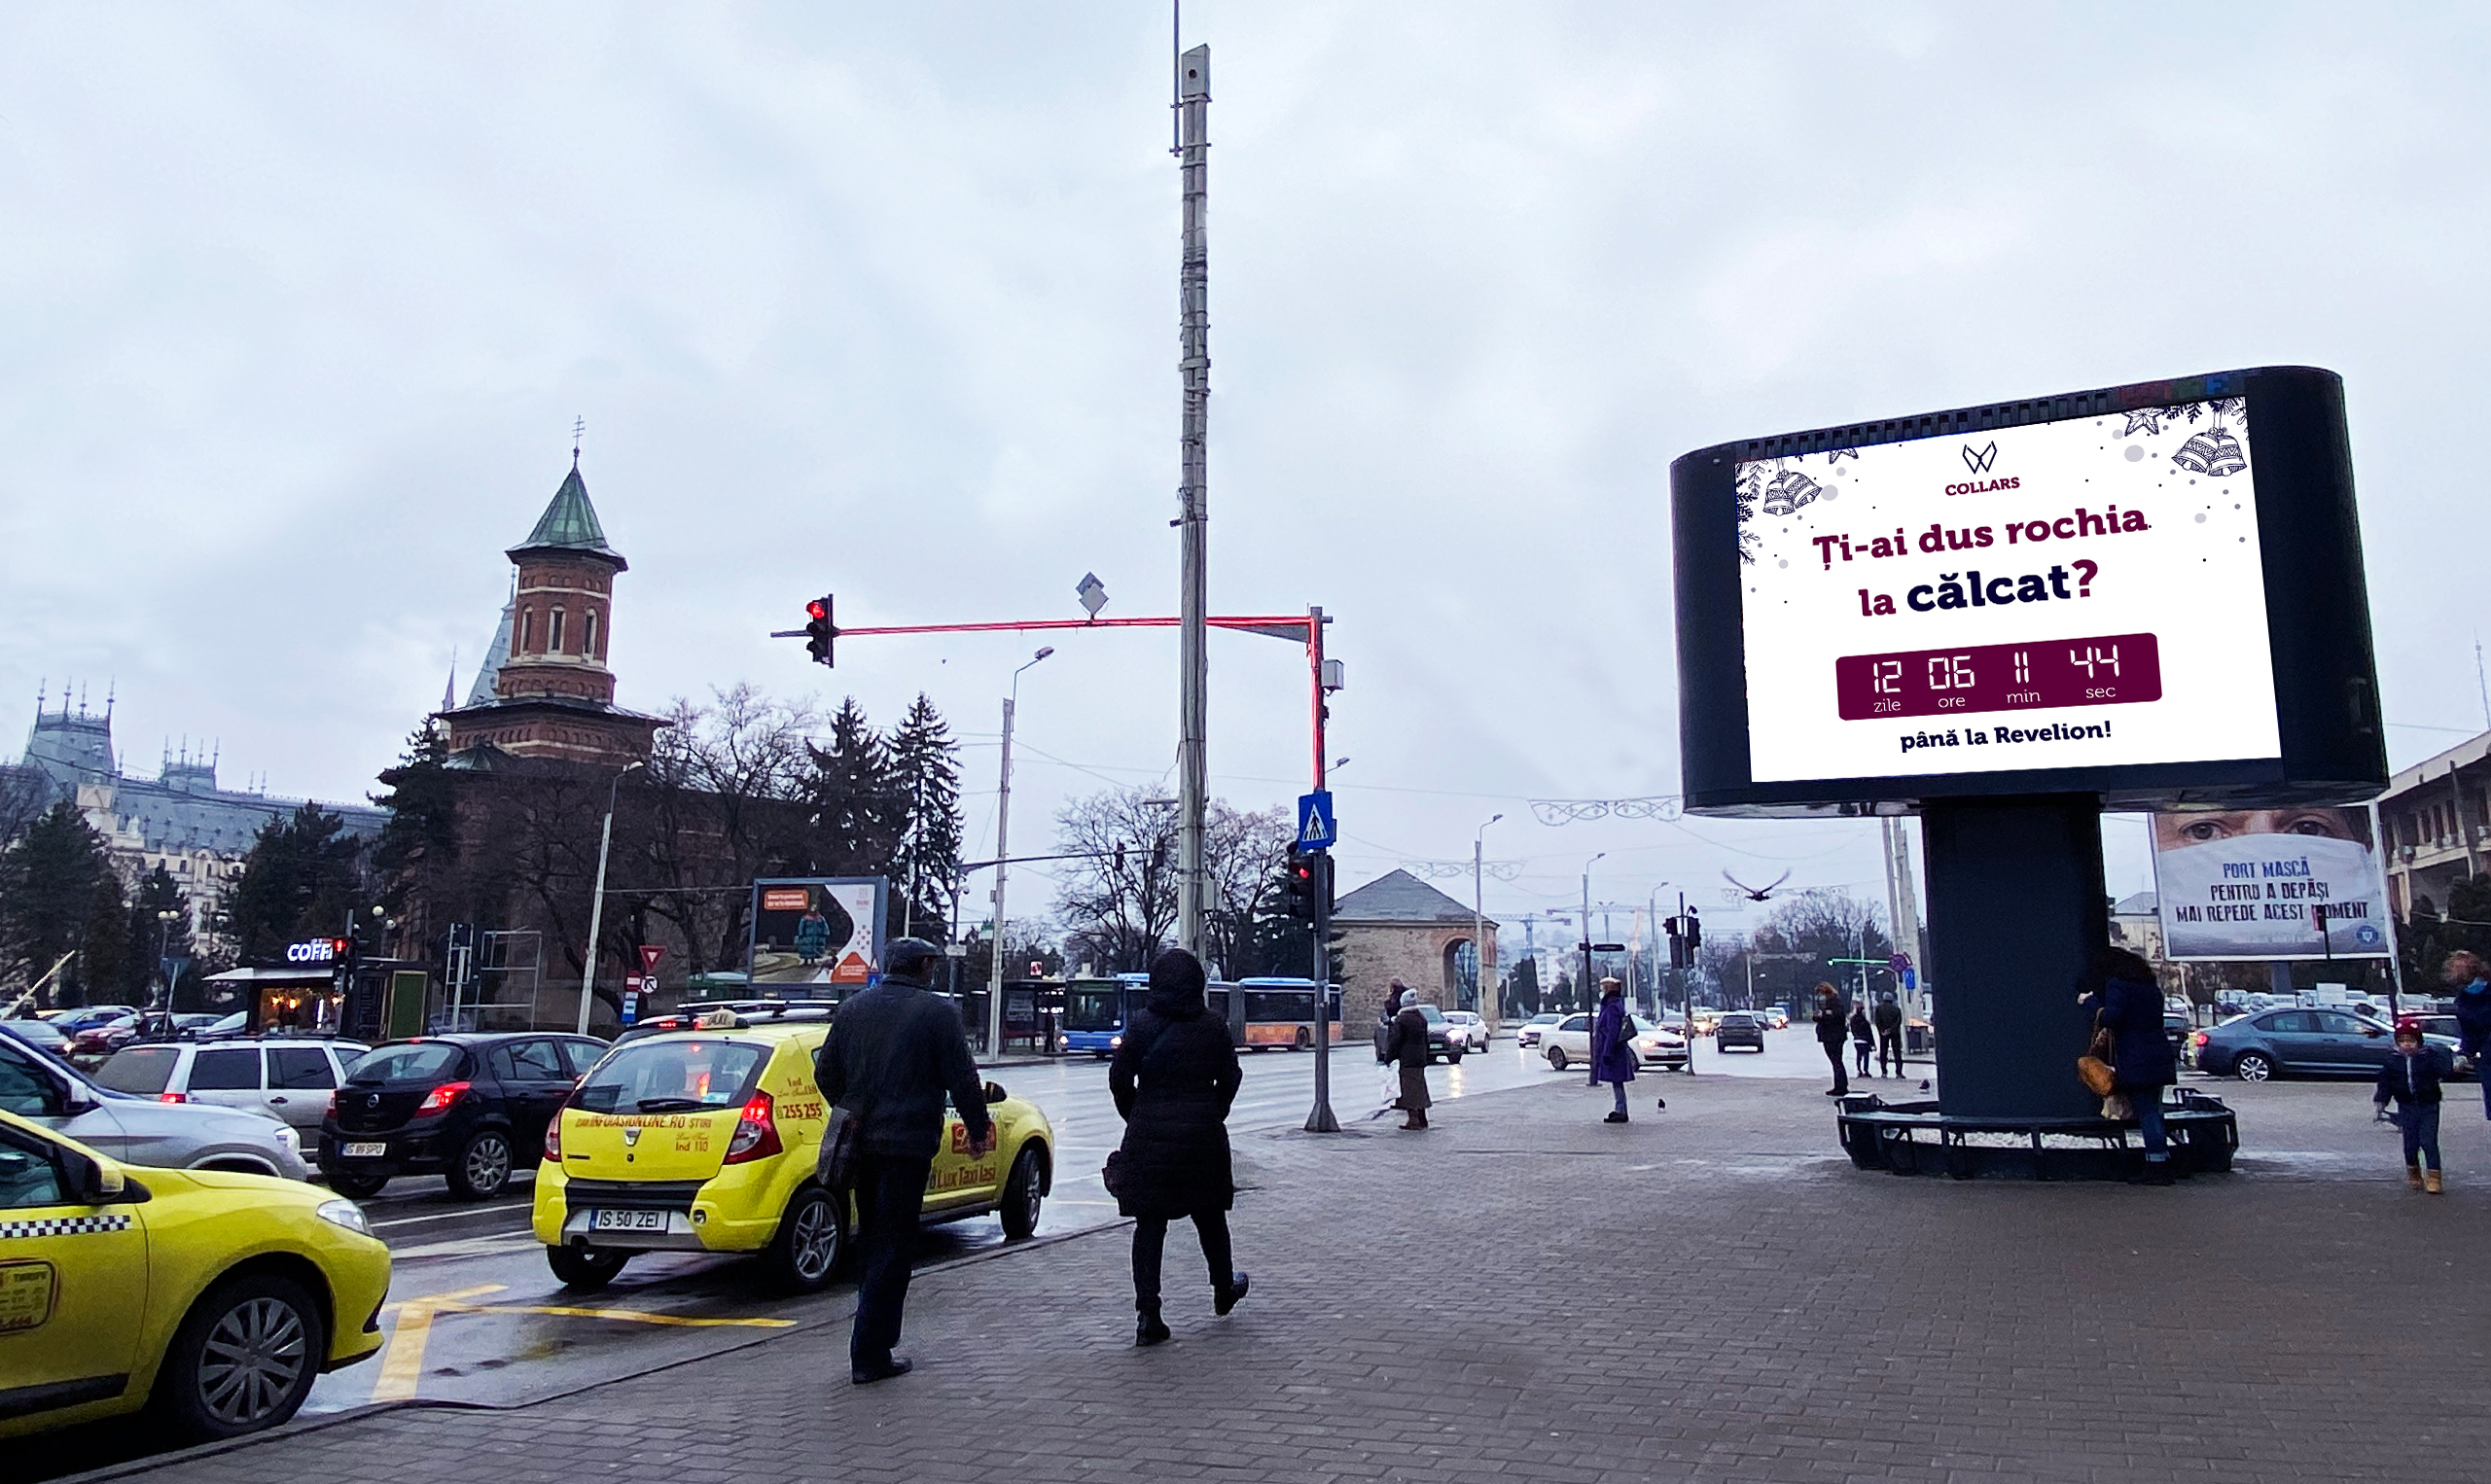 2-billboard-digital-iasi-counter-publicitate-collars